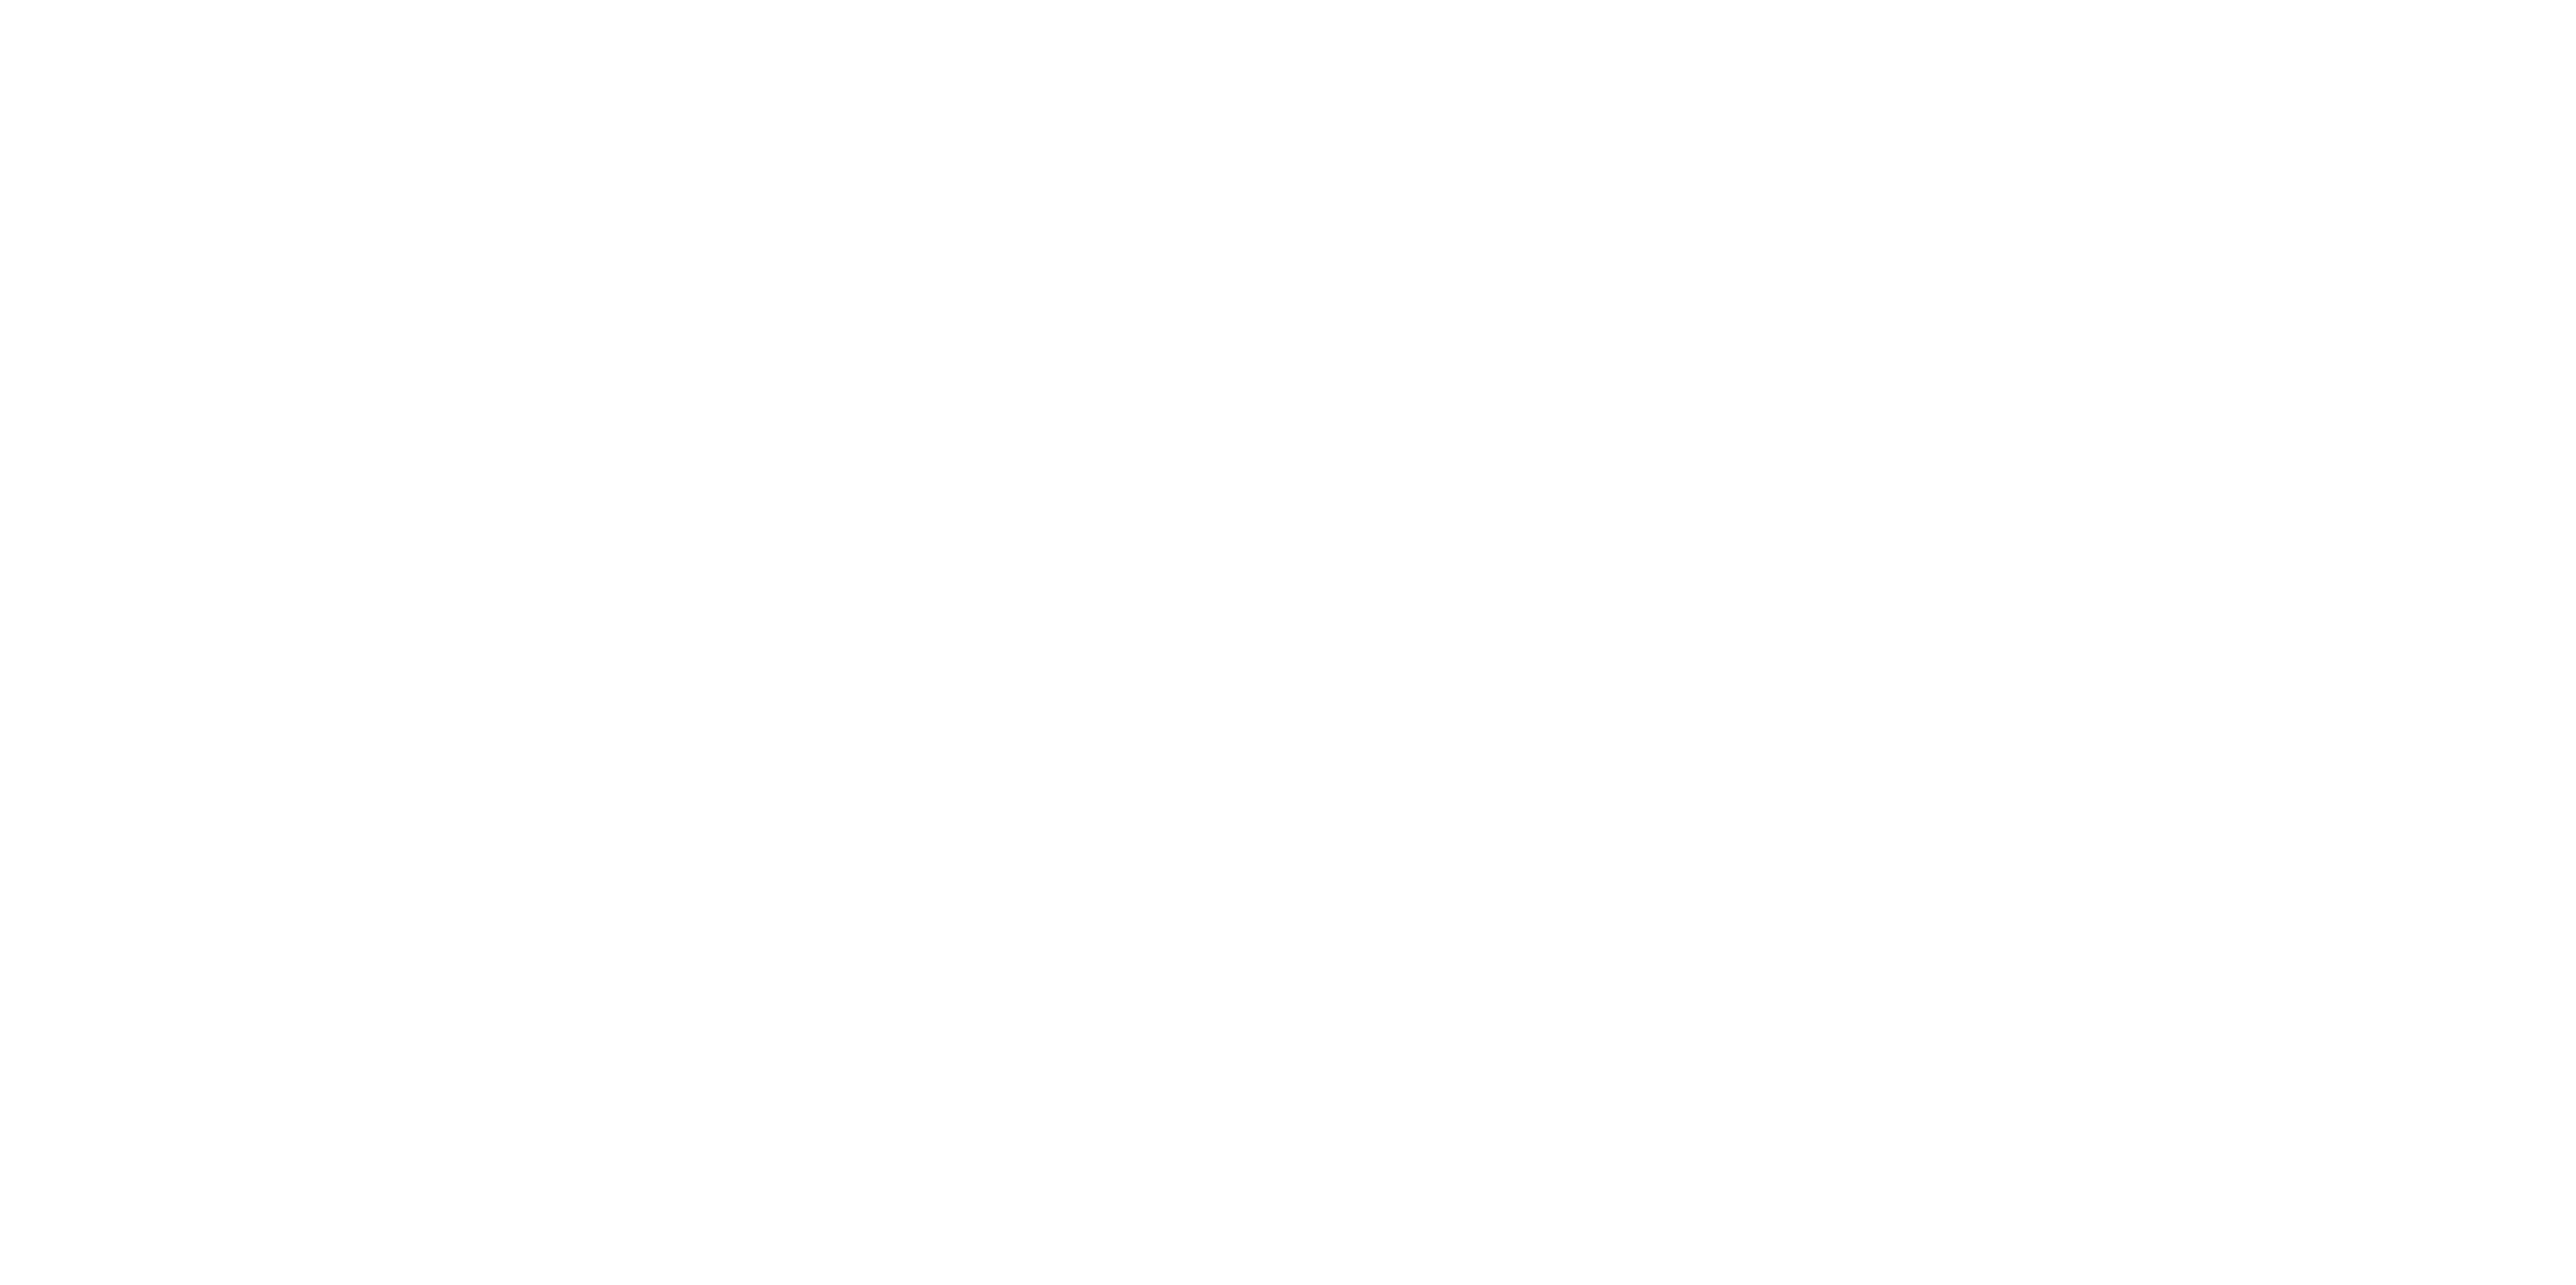 LOGO SHADDOWS BLANC